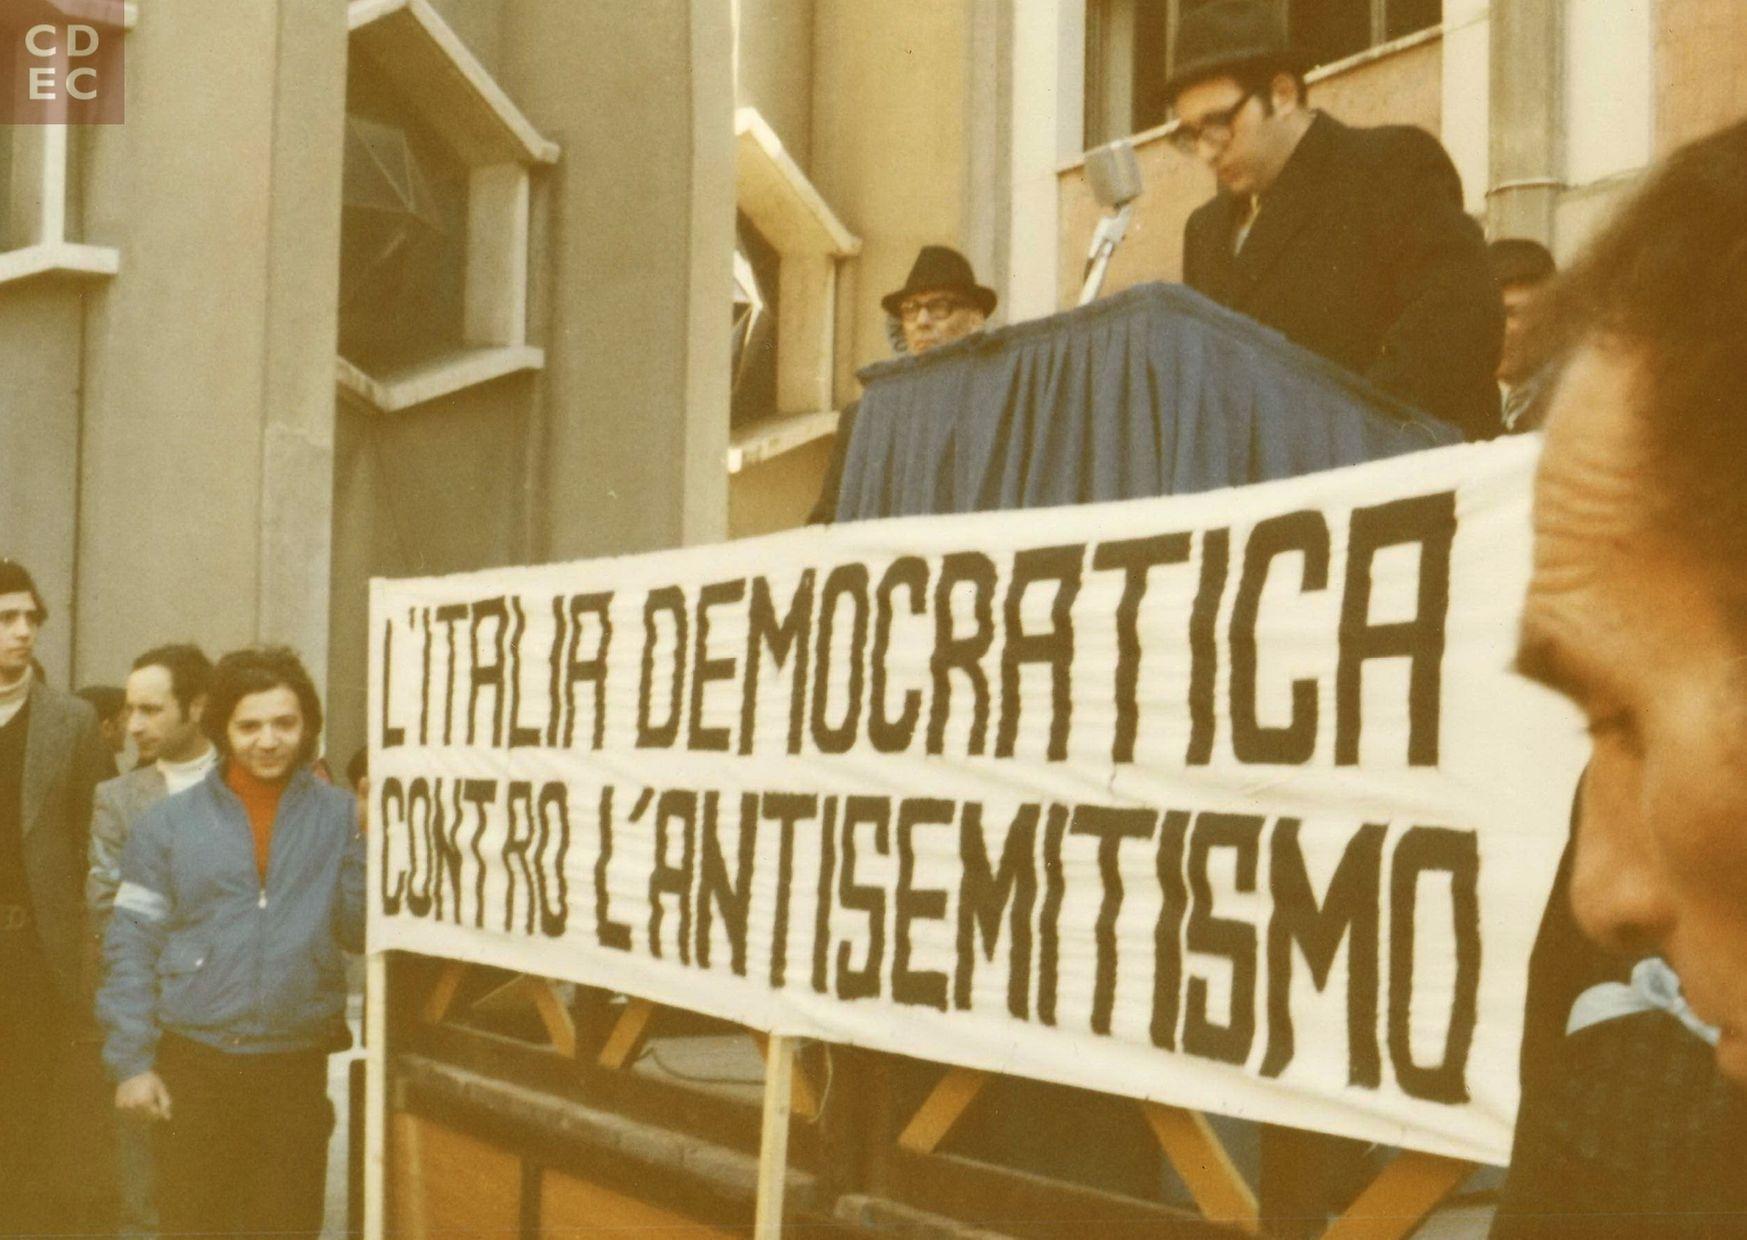 La nascita dell'Osservatorio antisemitismo